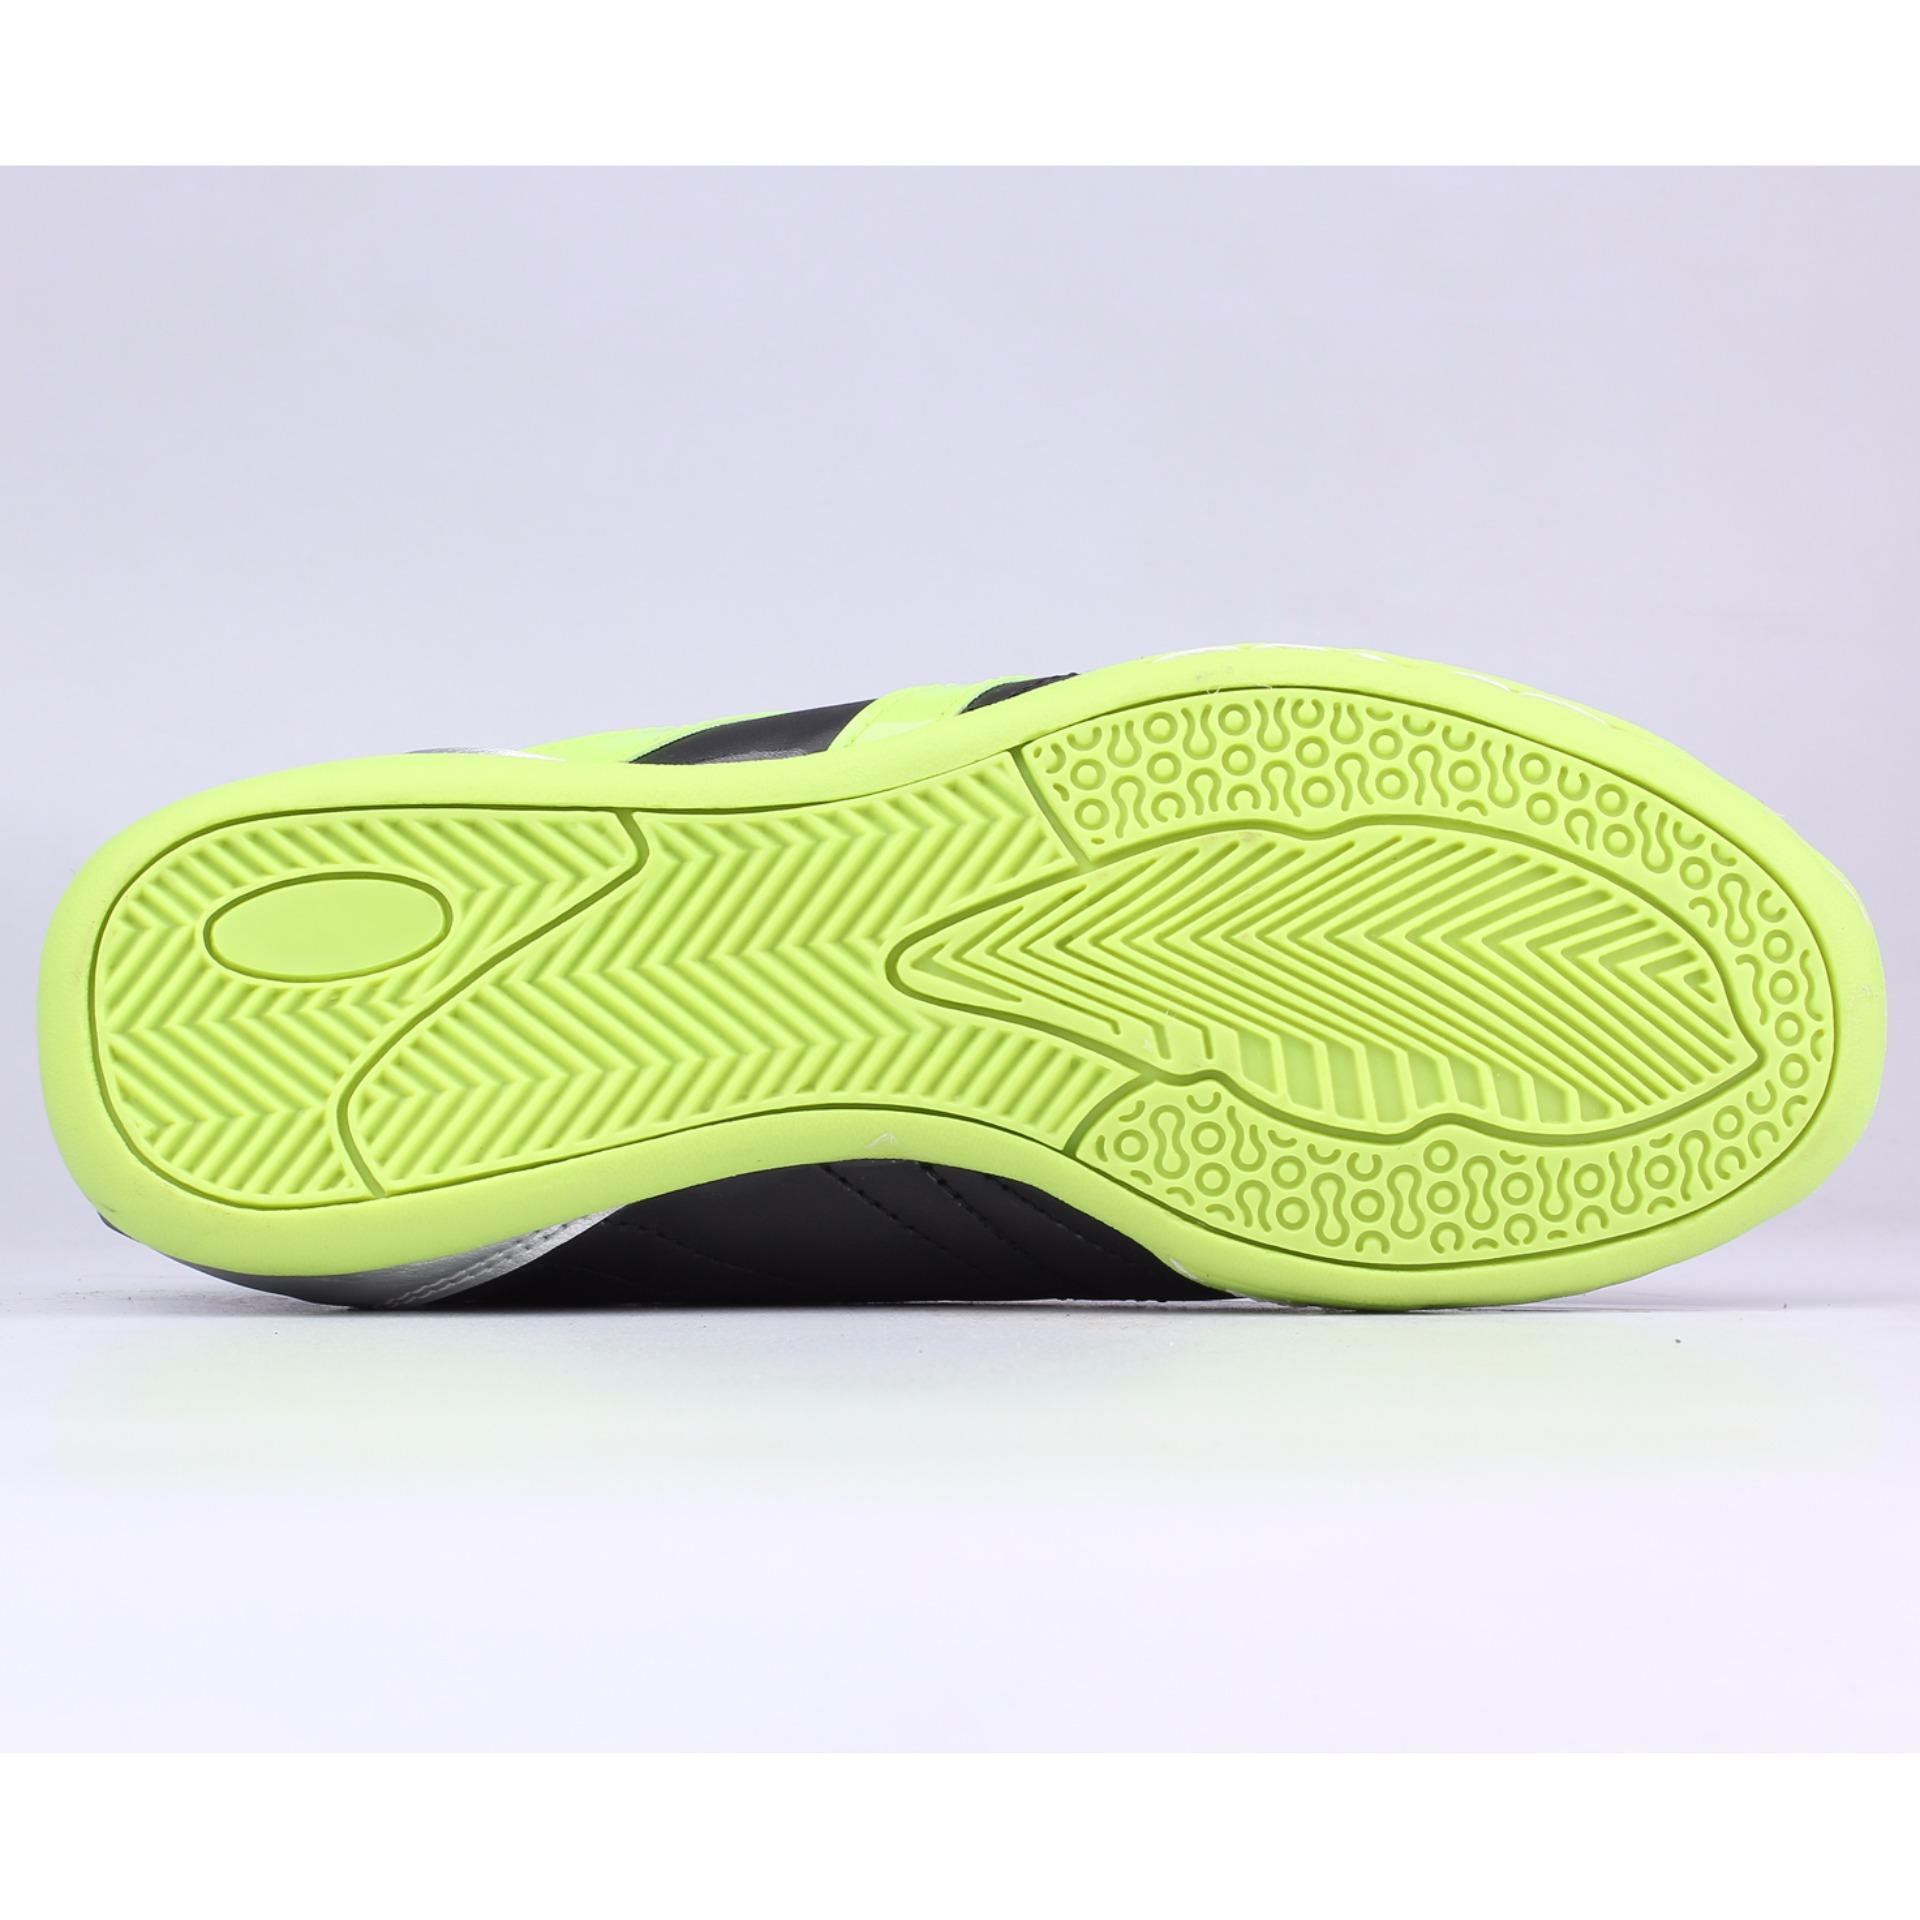 Pencari Harga Catenzo Sport Shoes Sepatu Futsal Pria Ns 090 High Super Black Green